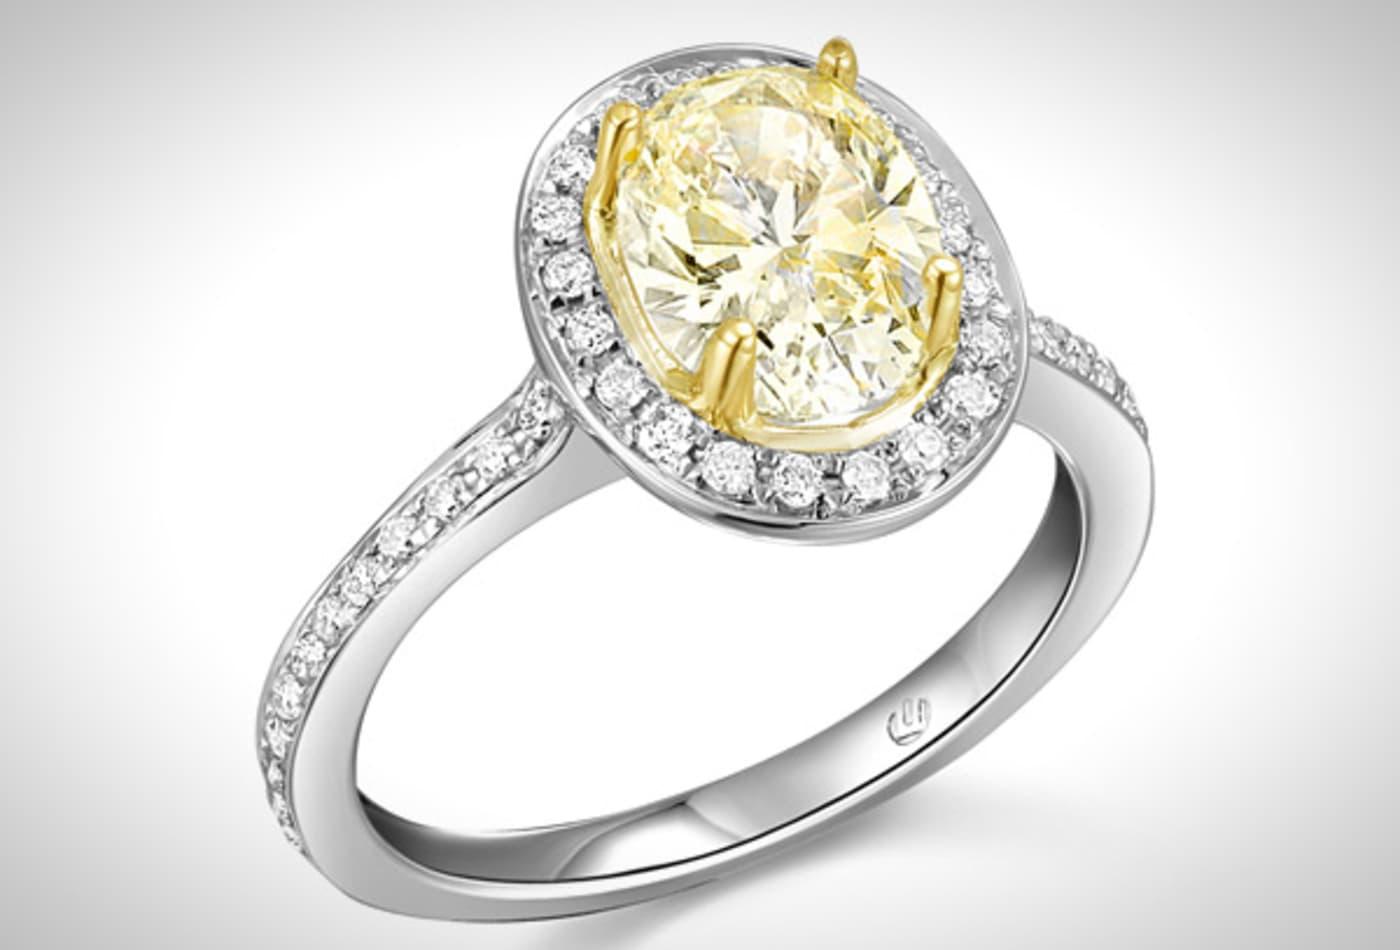 cosco-wedding-yellow-diamond-bridal-ring.jpg